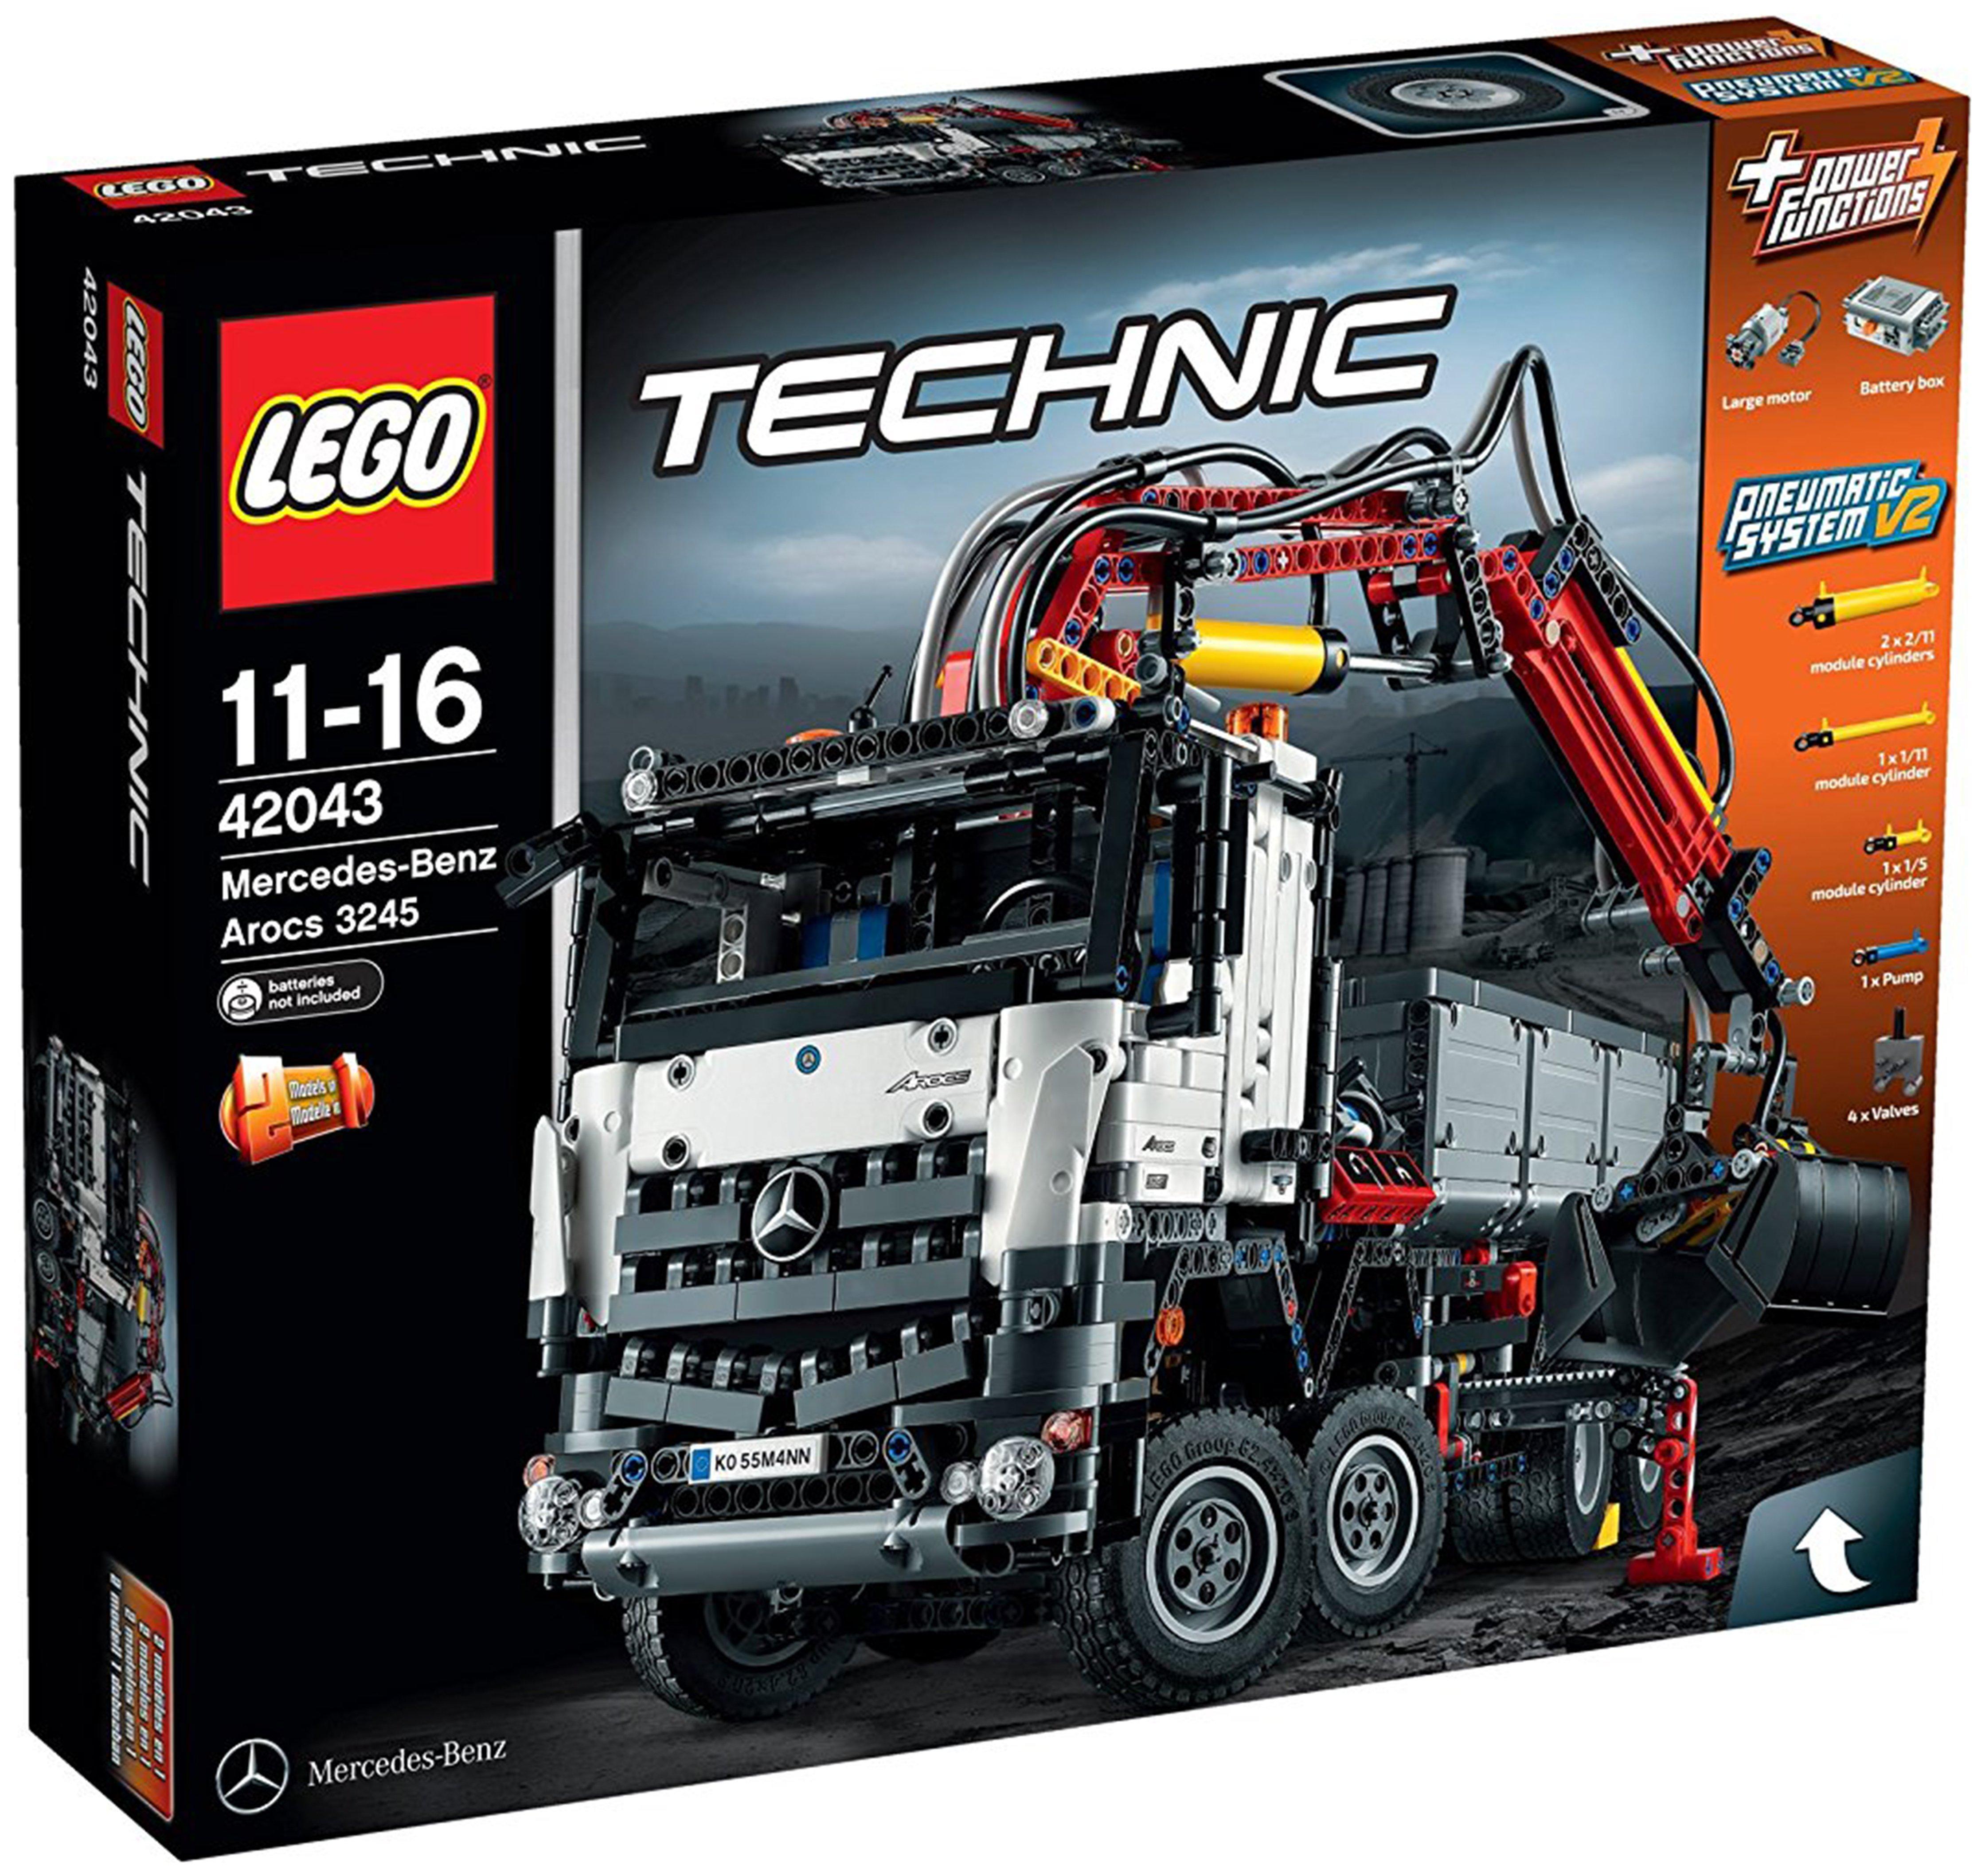 Image of LEGO Technic Mercedes-Benz Arocs - 42043